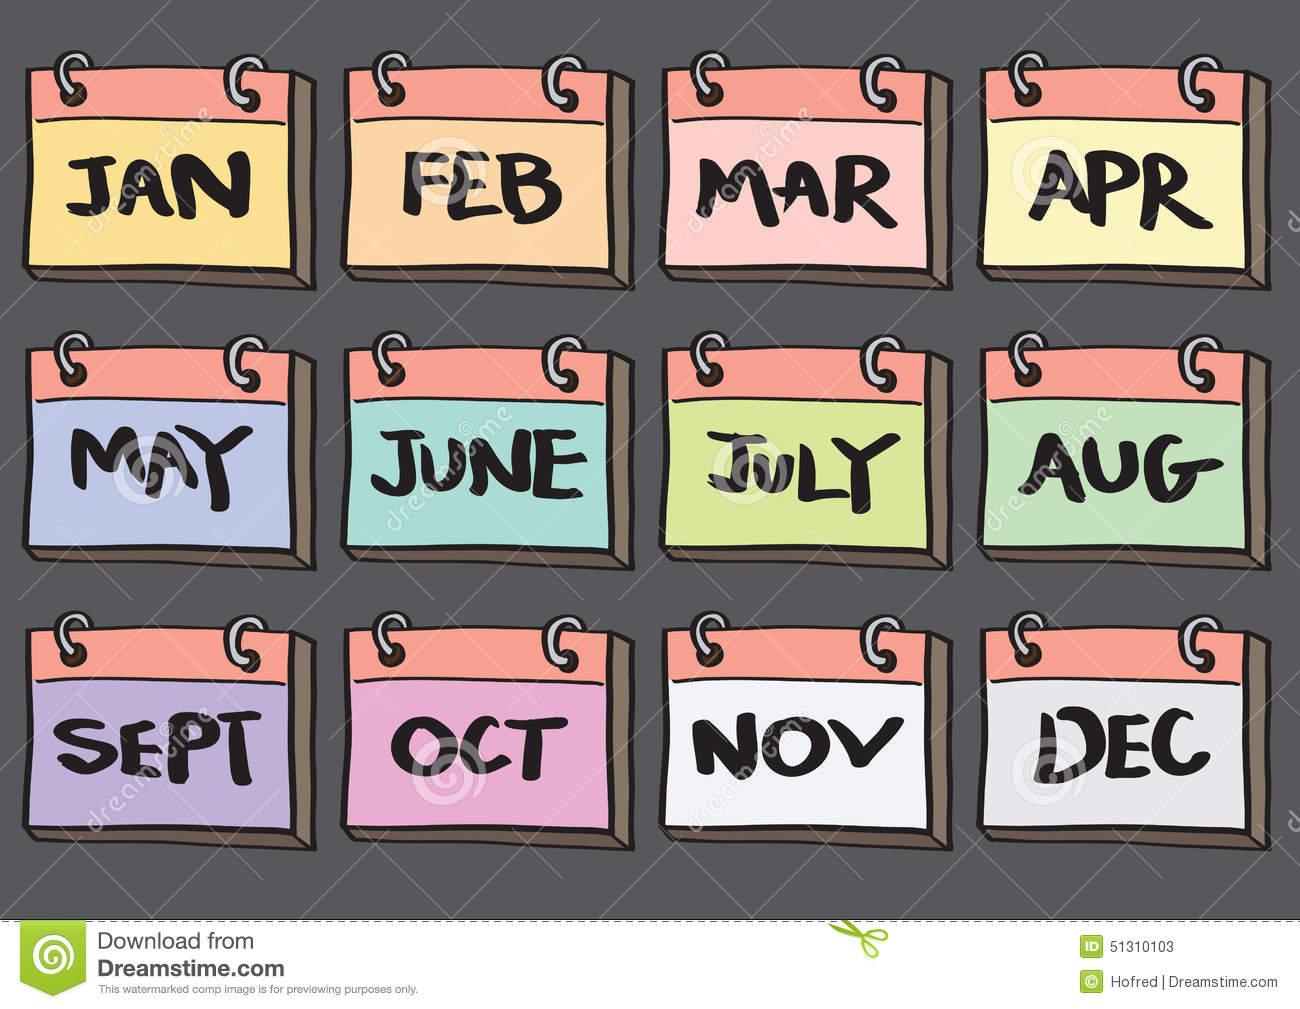 months - เดือนภาษาอังกฤษ